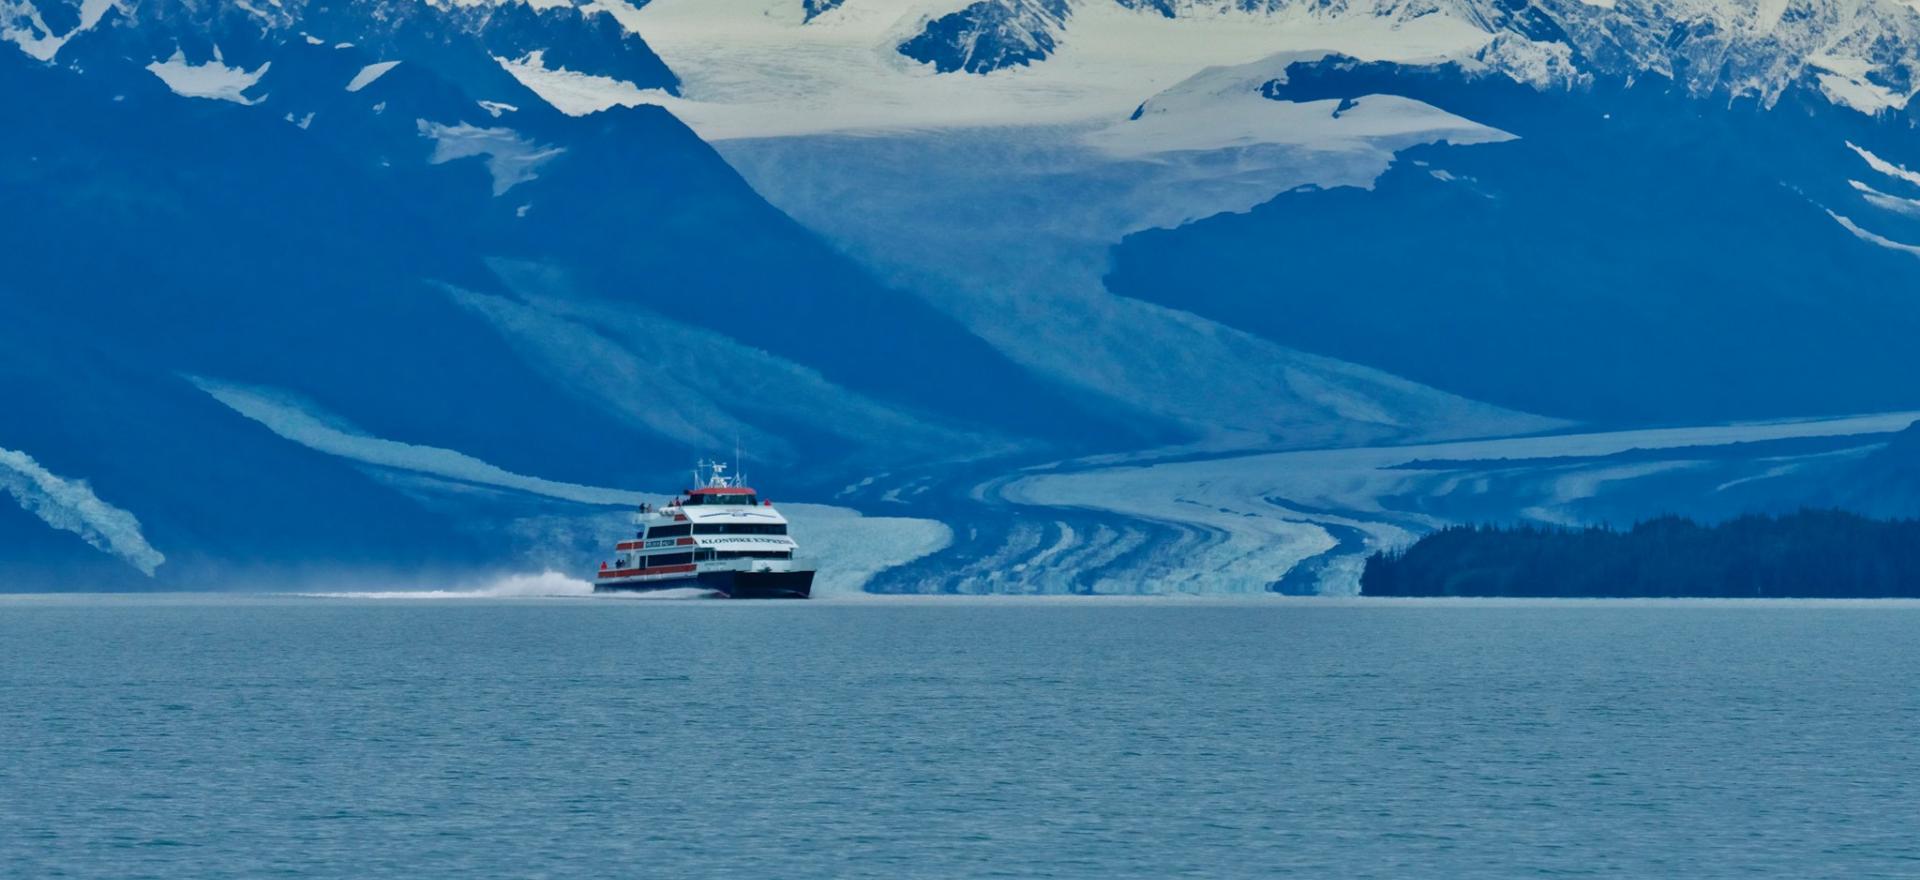 Phillips Cruises & Tours, LLC – 26 Glacier Cruise